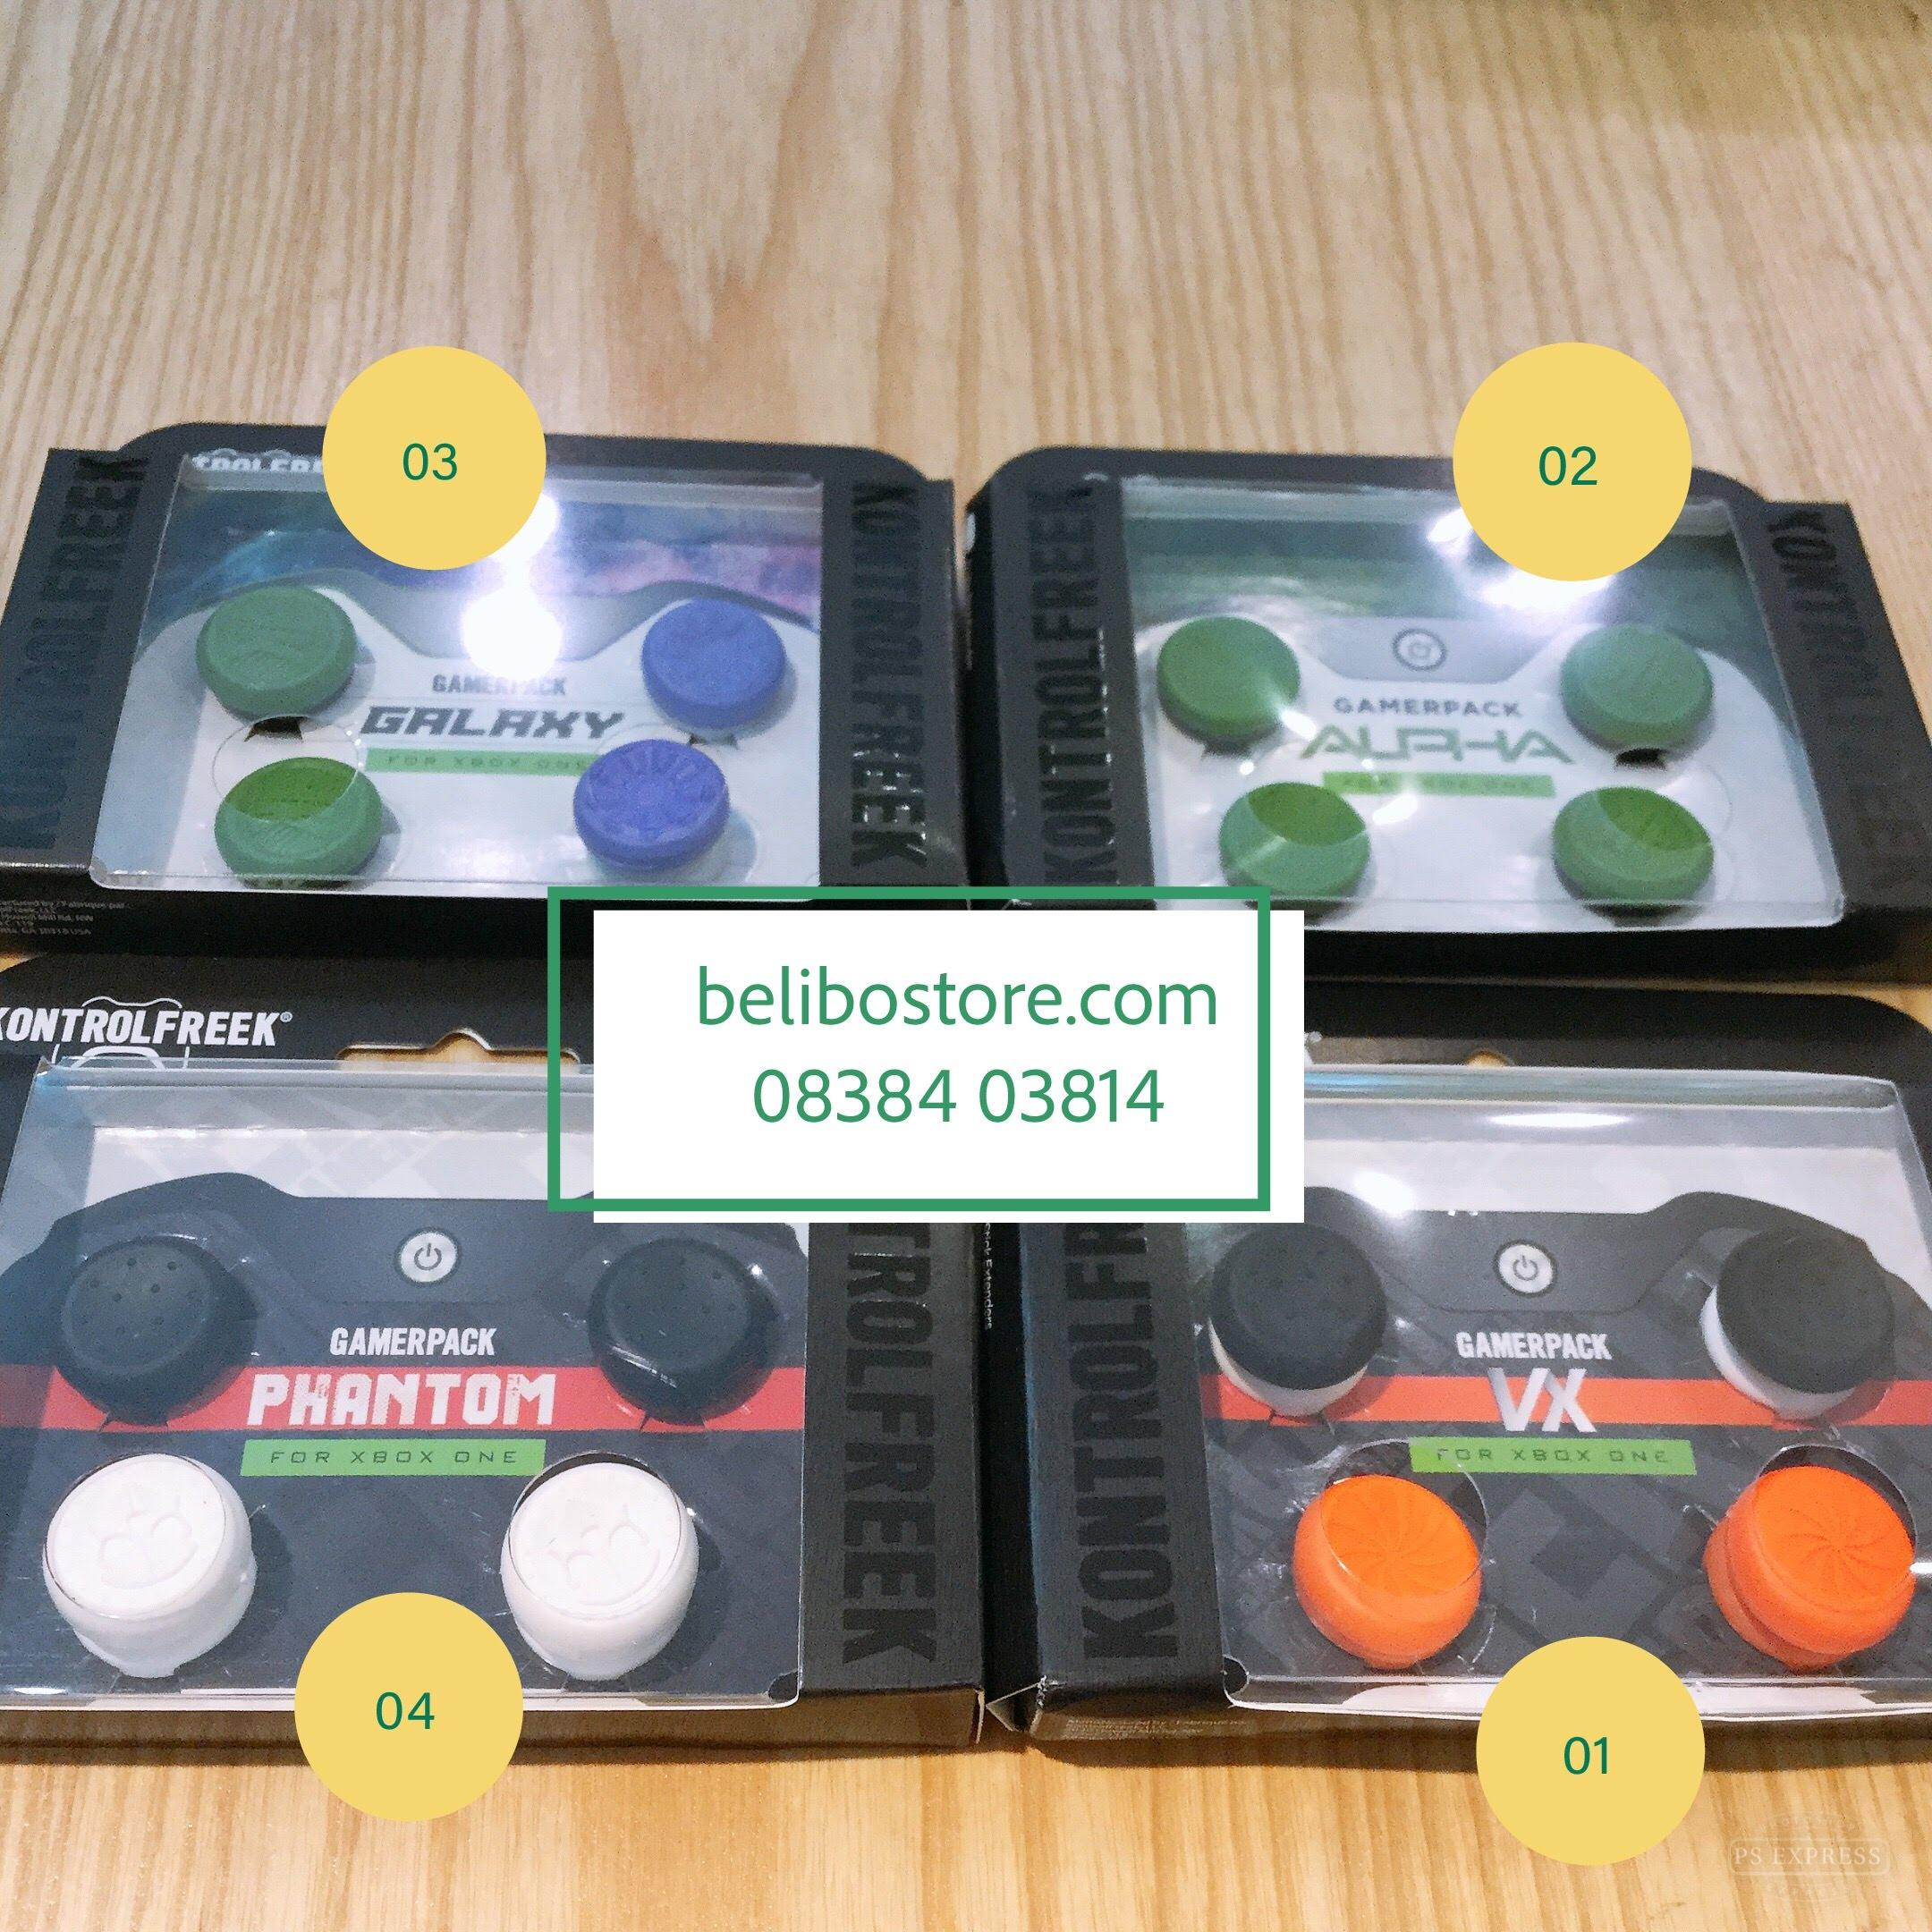 25-mau-nu-m-bo-c-kontrolfreek-cho-analog-cua-tay-ca-m-choi-game-xbox-one-xbox-on